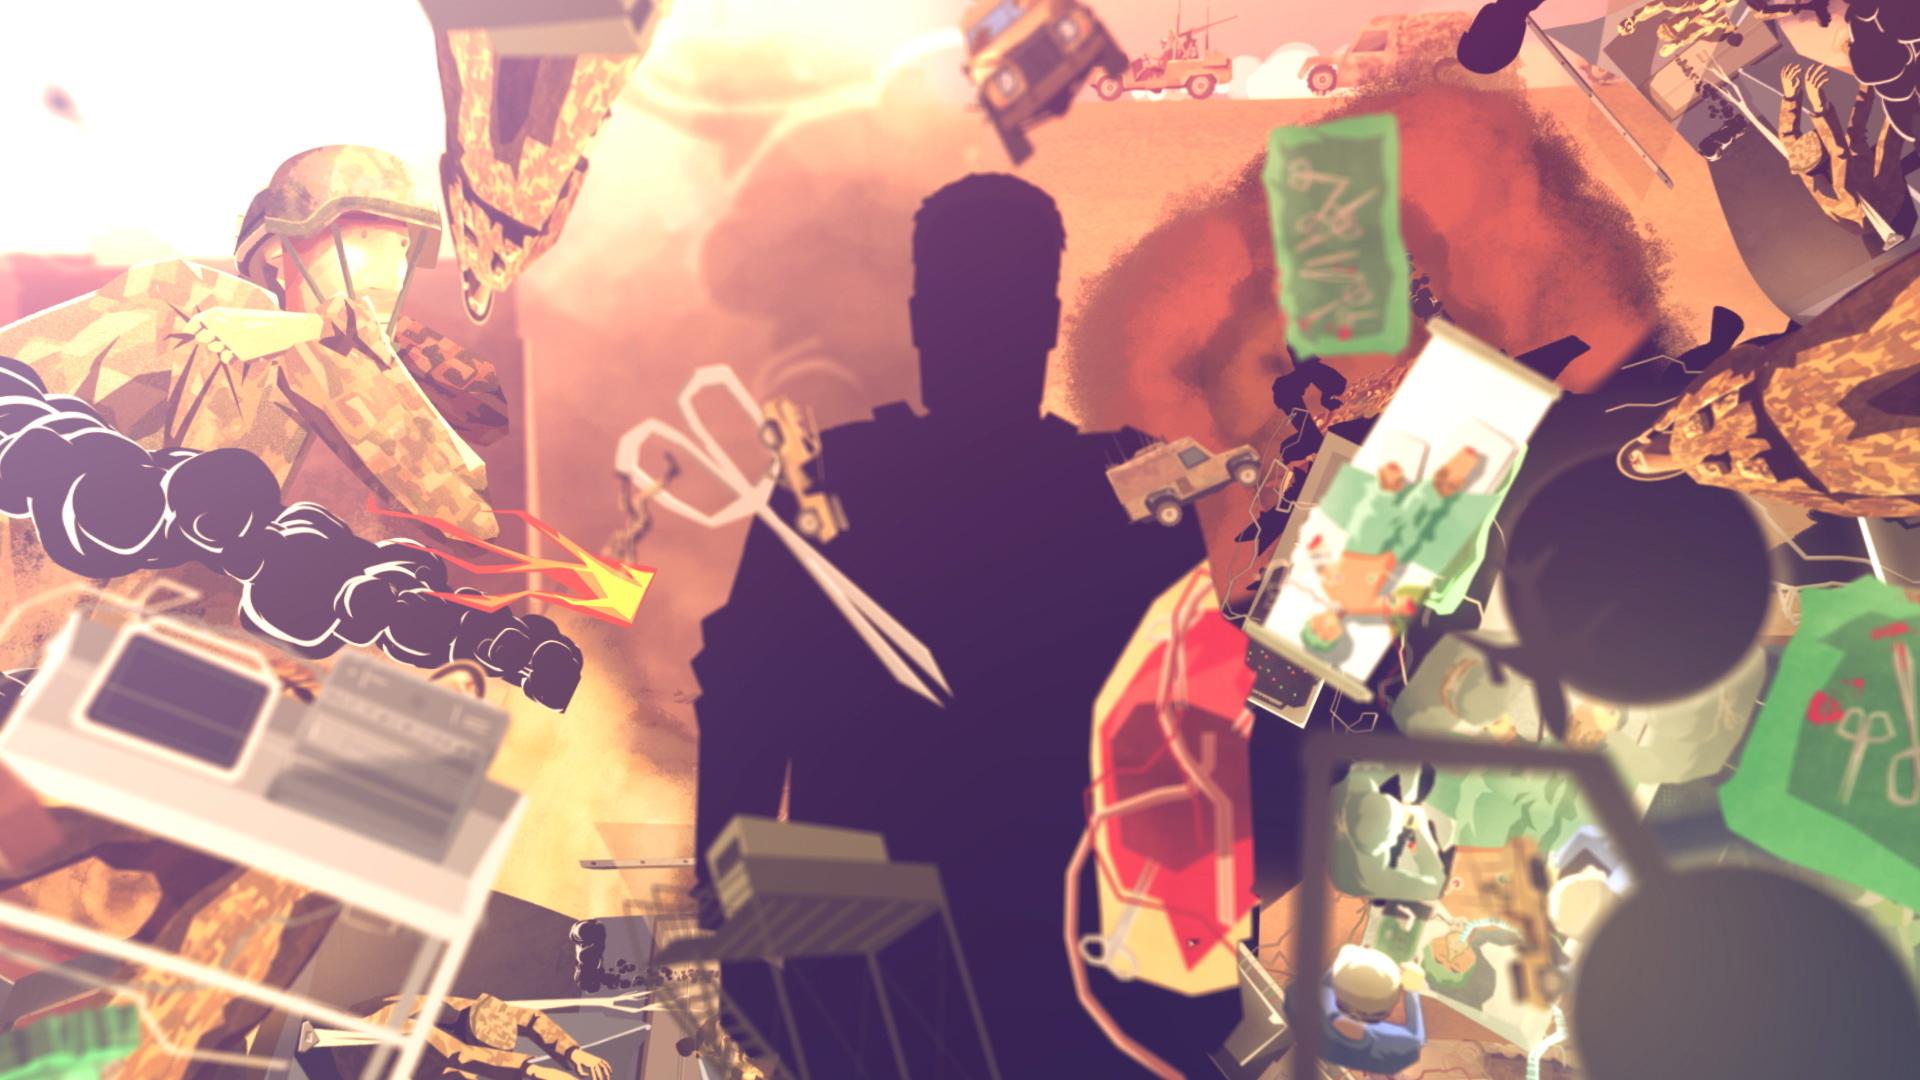 Mosaic-Films_Animation.jpg